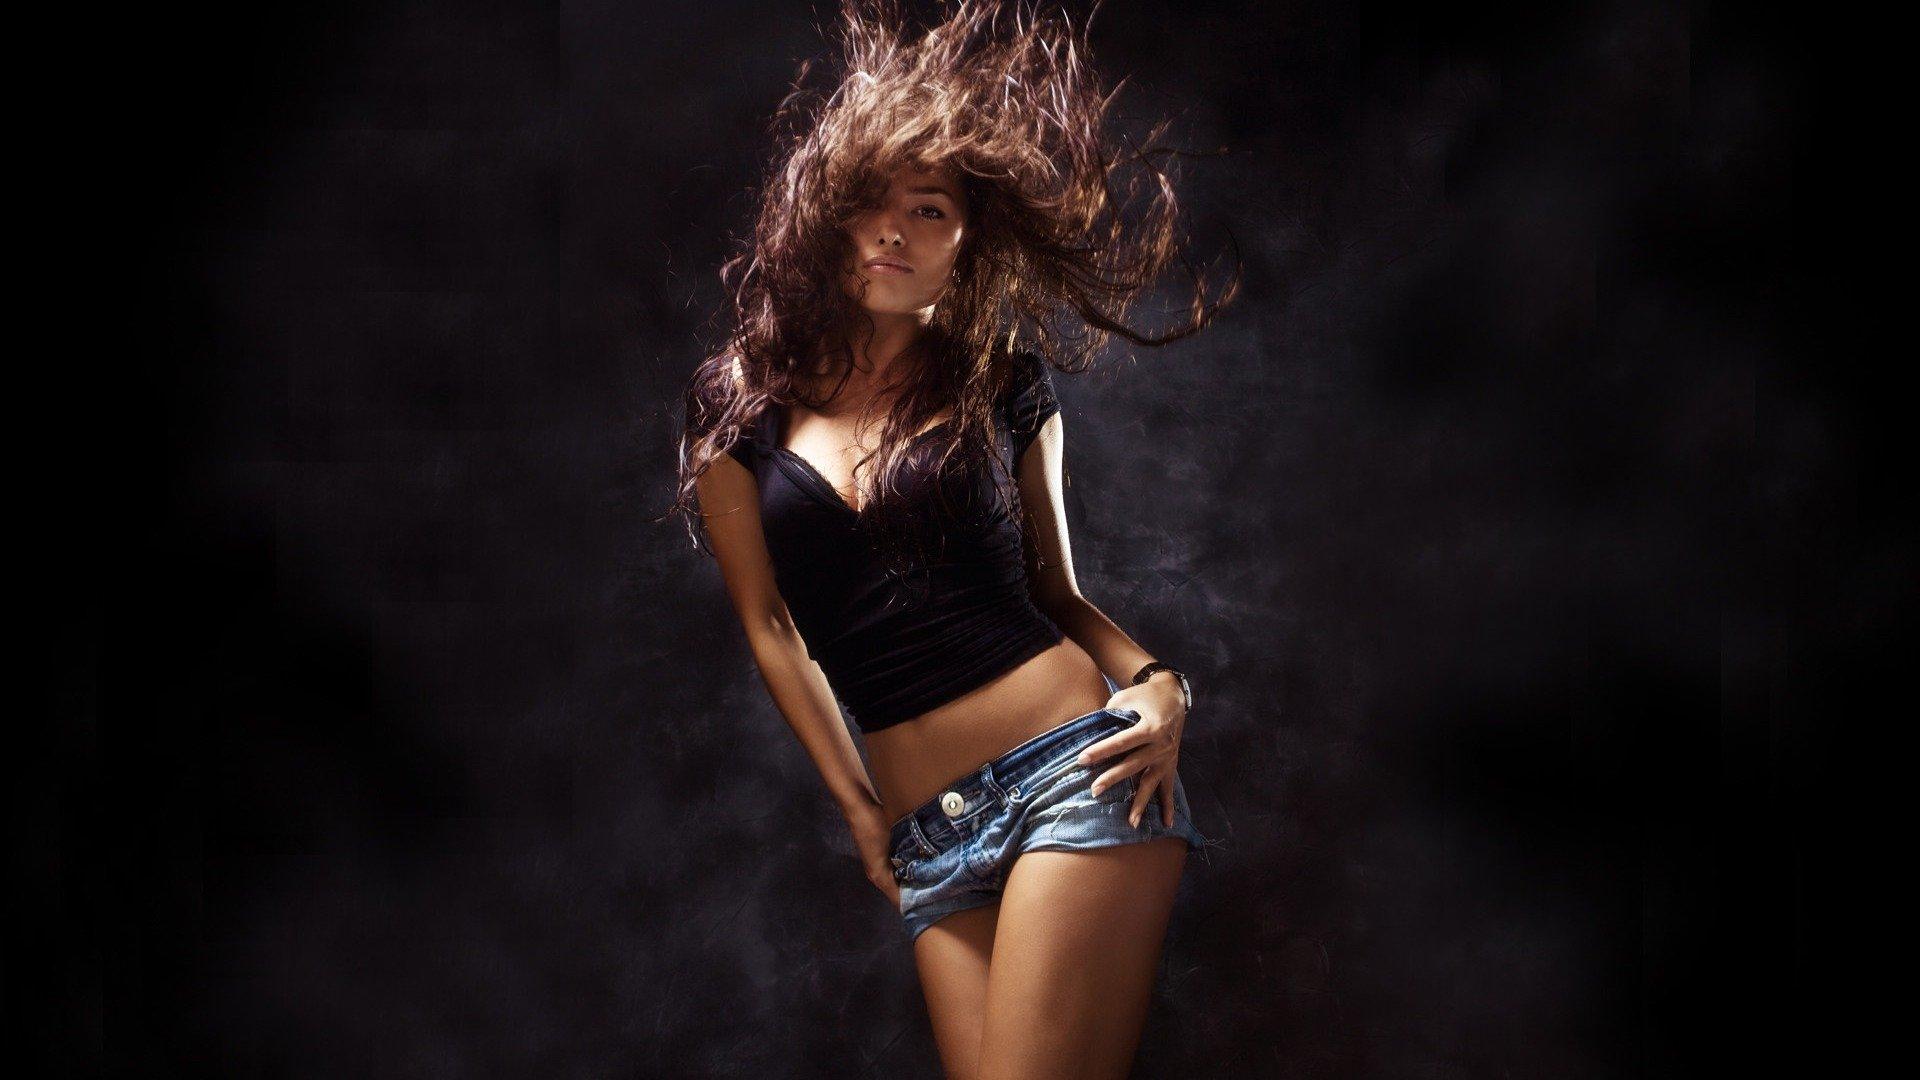 hip hop style figures trend dance short girl belly wallpaper